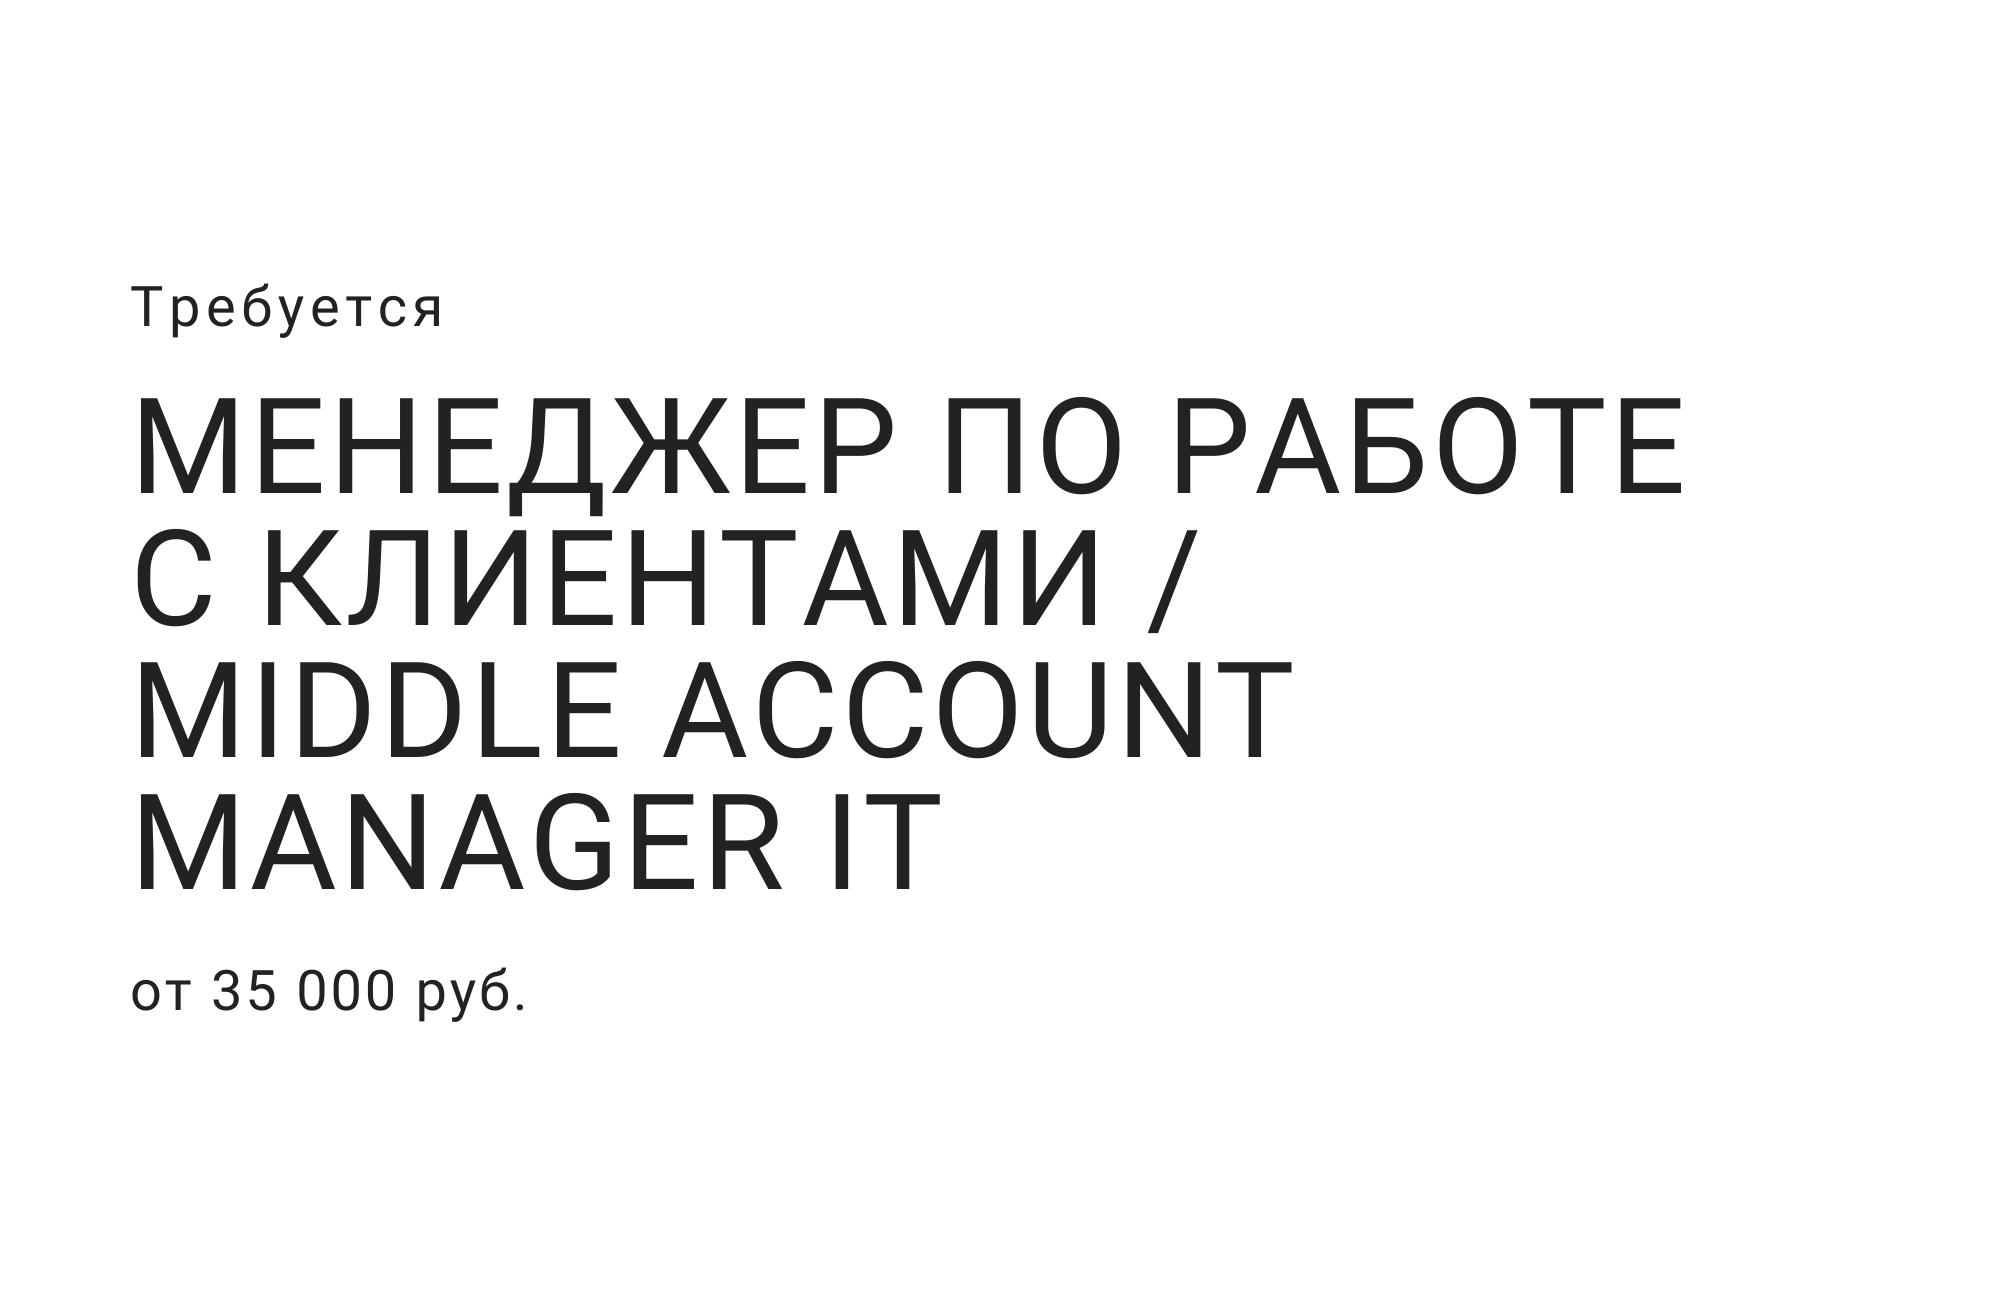 Middle Account manager IT / Менеджер по работе с клиентами